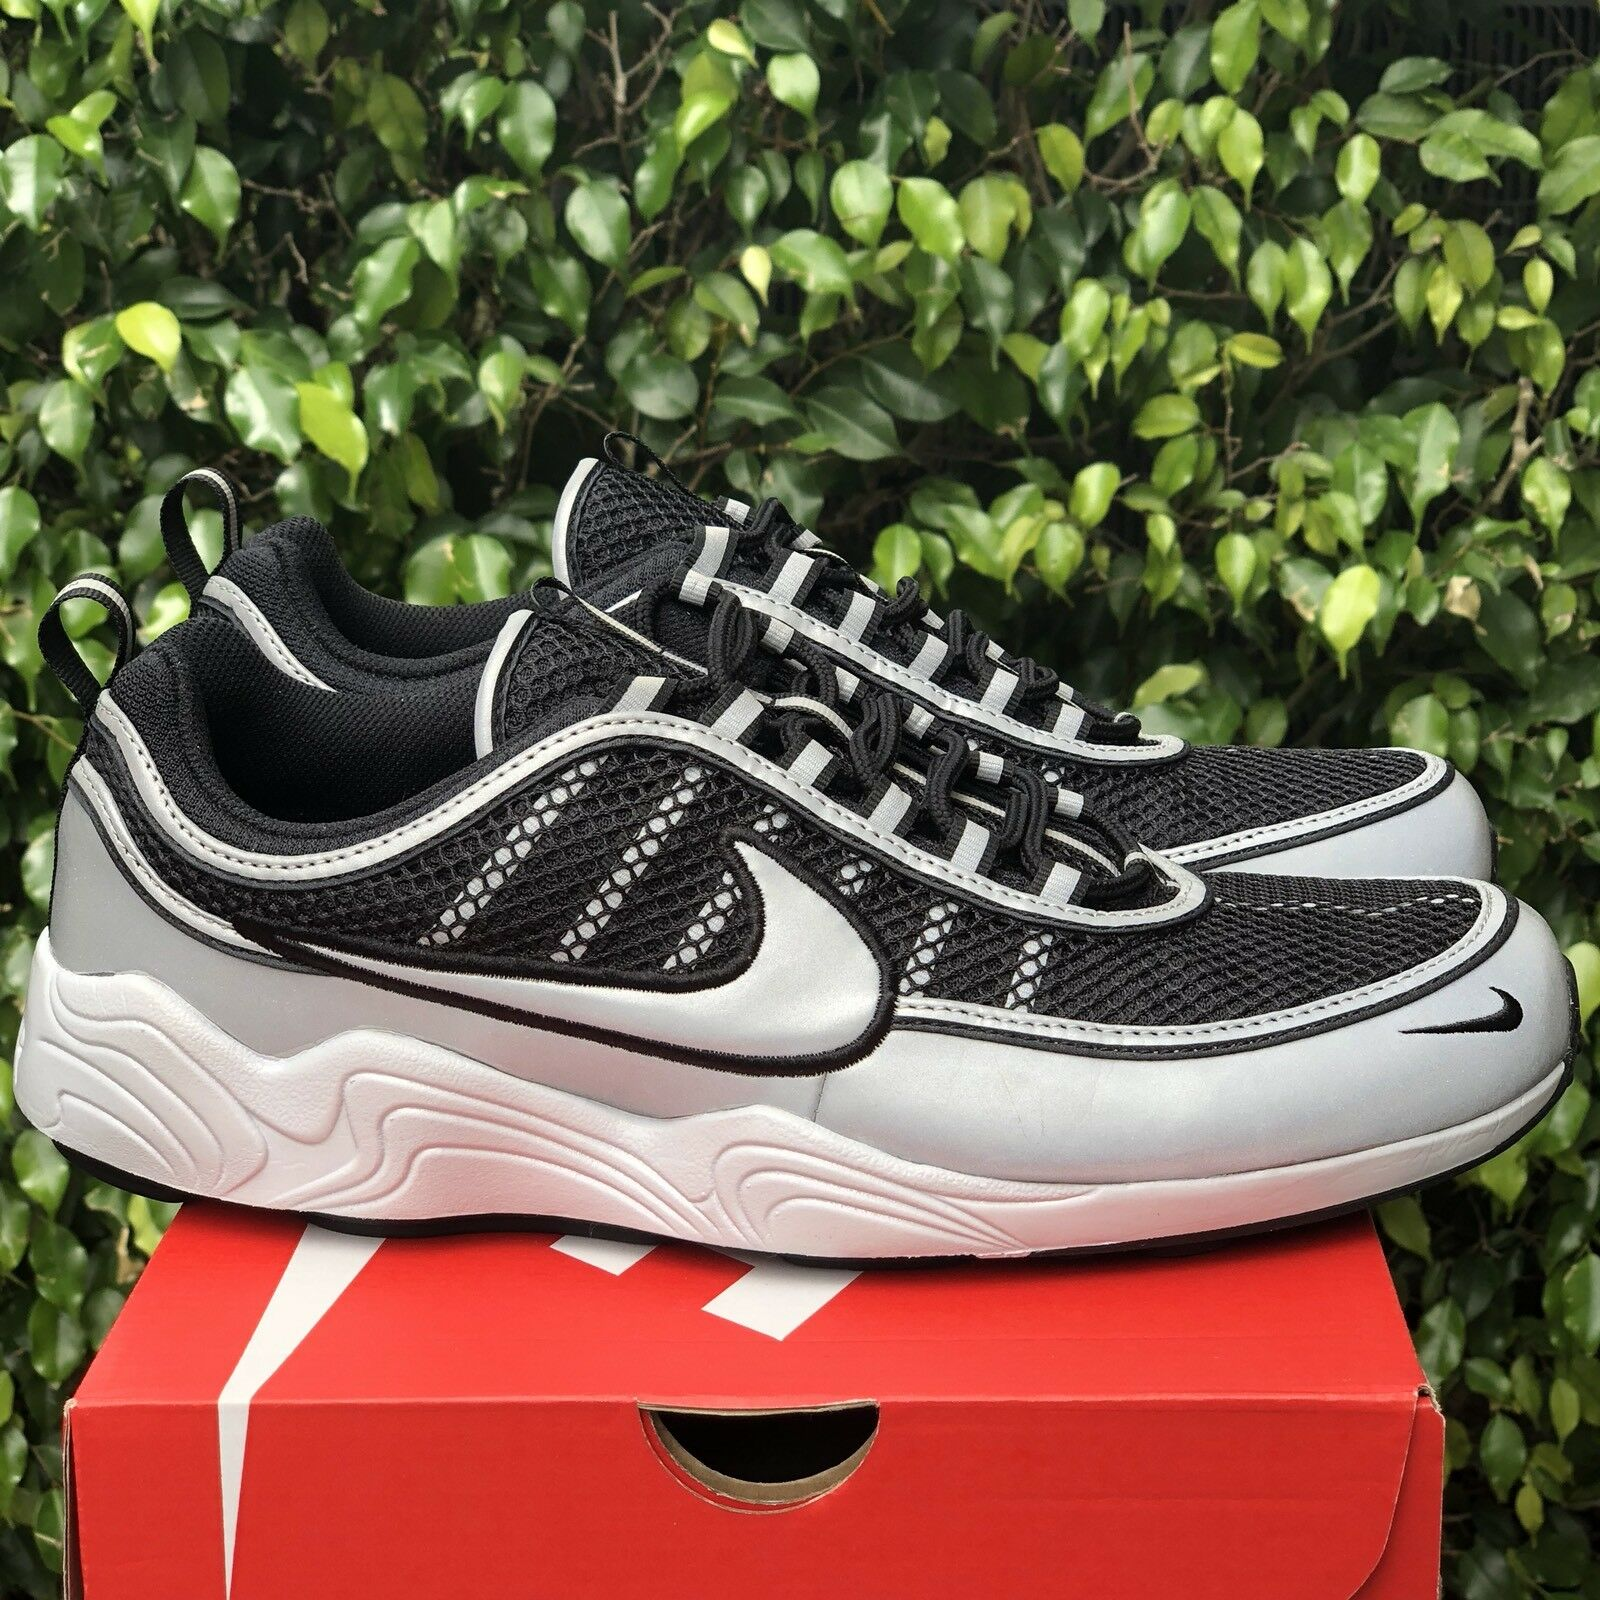 Nike air zoom spiridon scarpe 16 metallico riflettente 926955 003 dimensioni scarpe spiridon neri. 6b6a7c